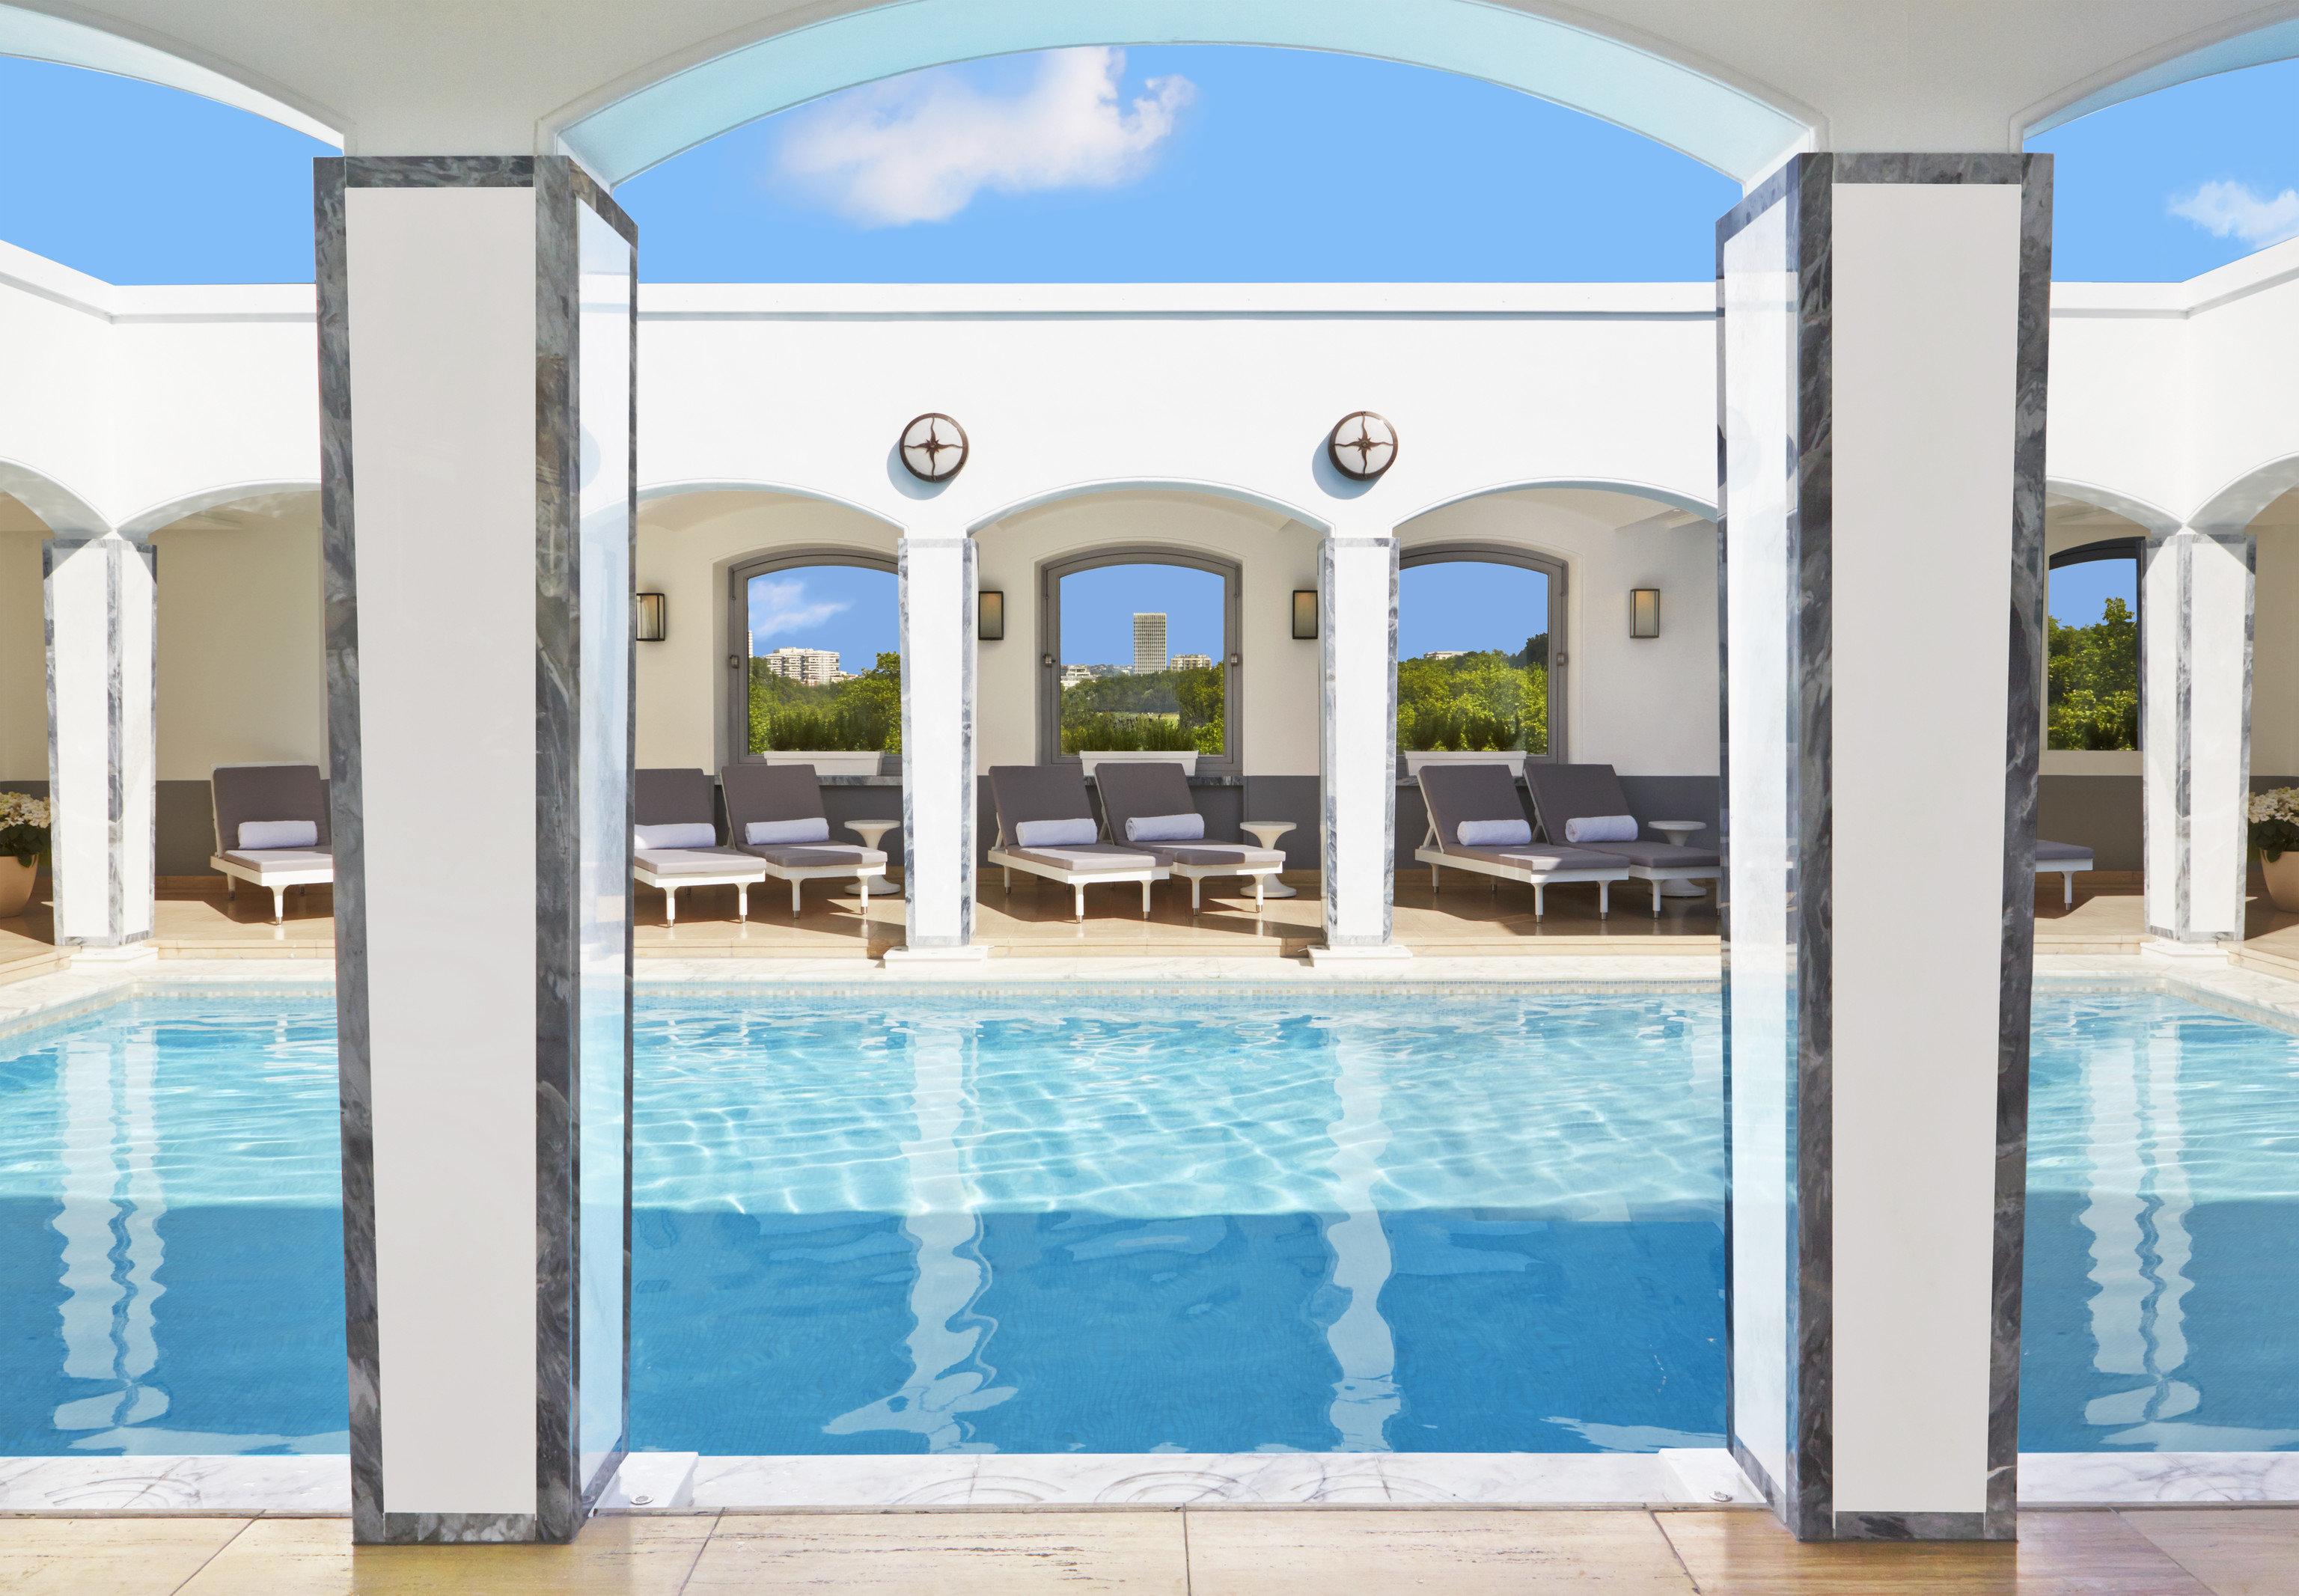 Hotels Luxury Travel swimming pool property building leisure centre estate condominium facade window interior design Resort Villa mansion blue colonnade